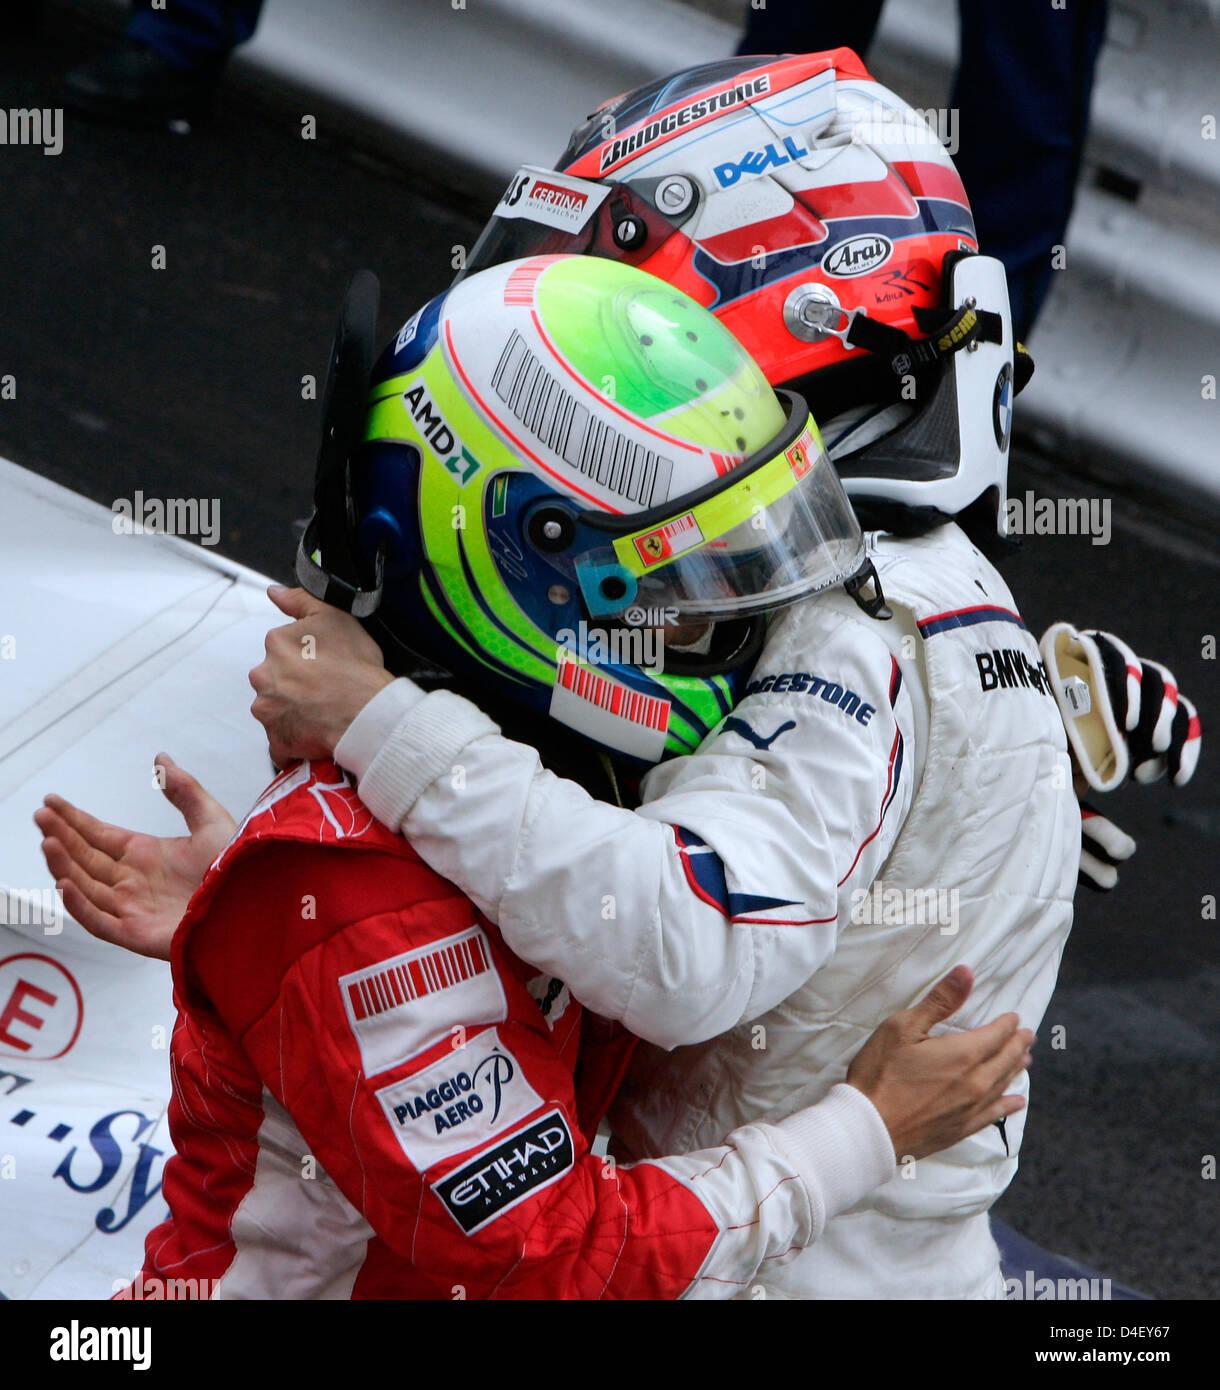 Brazilian formula one test driver nelson piquet jr. Of renault f1.